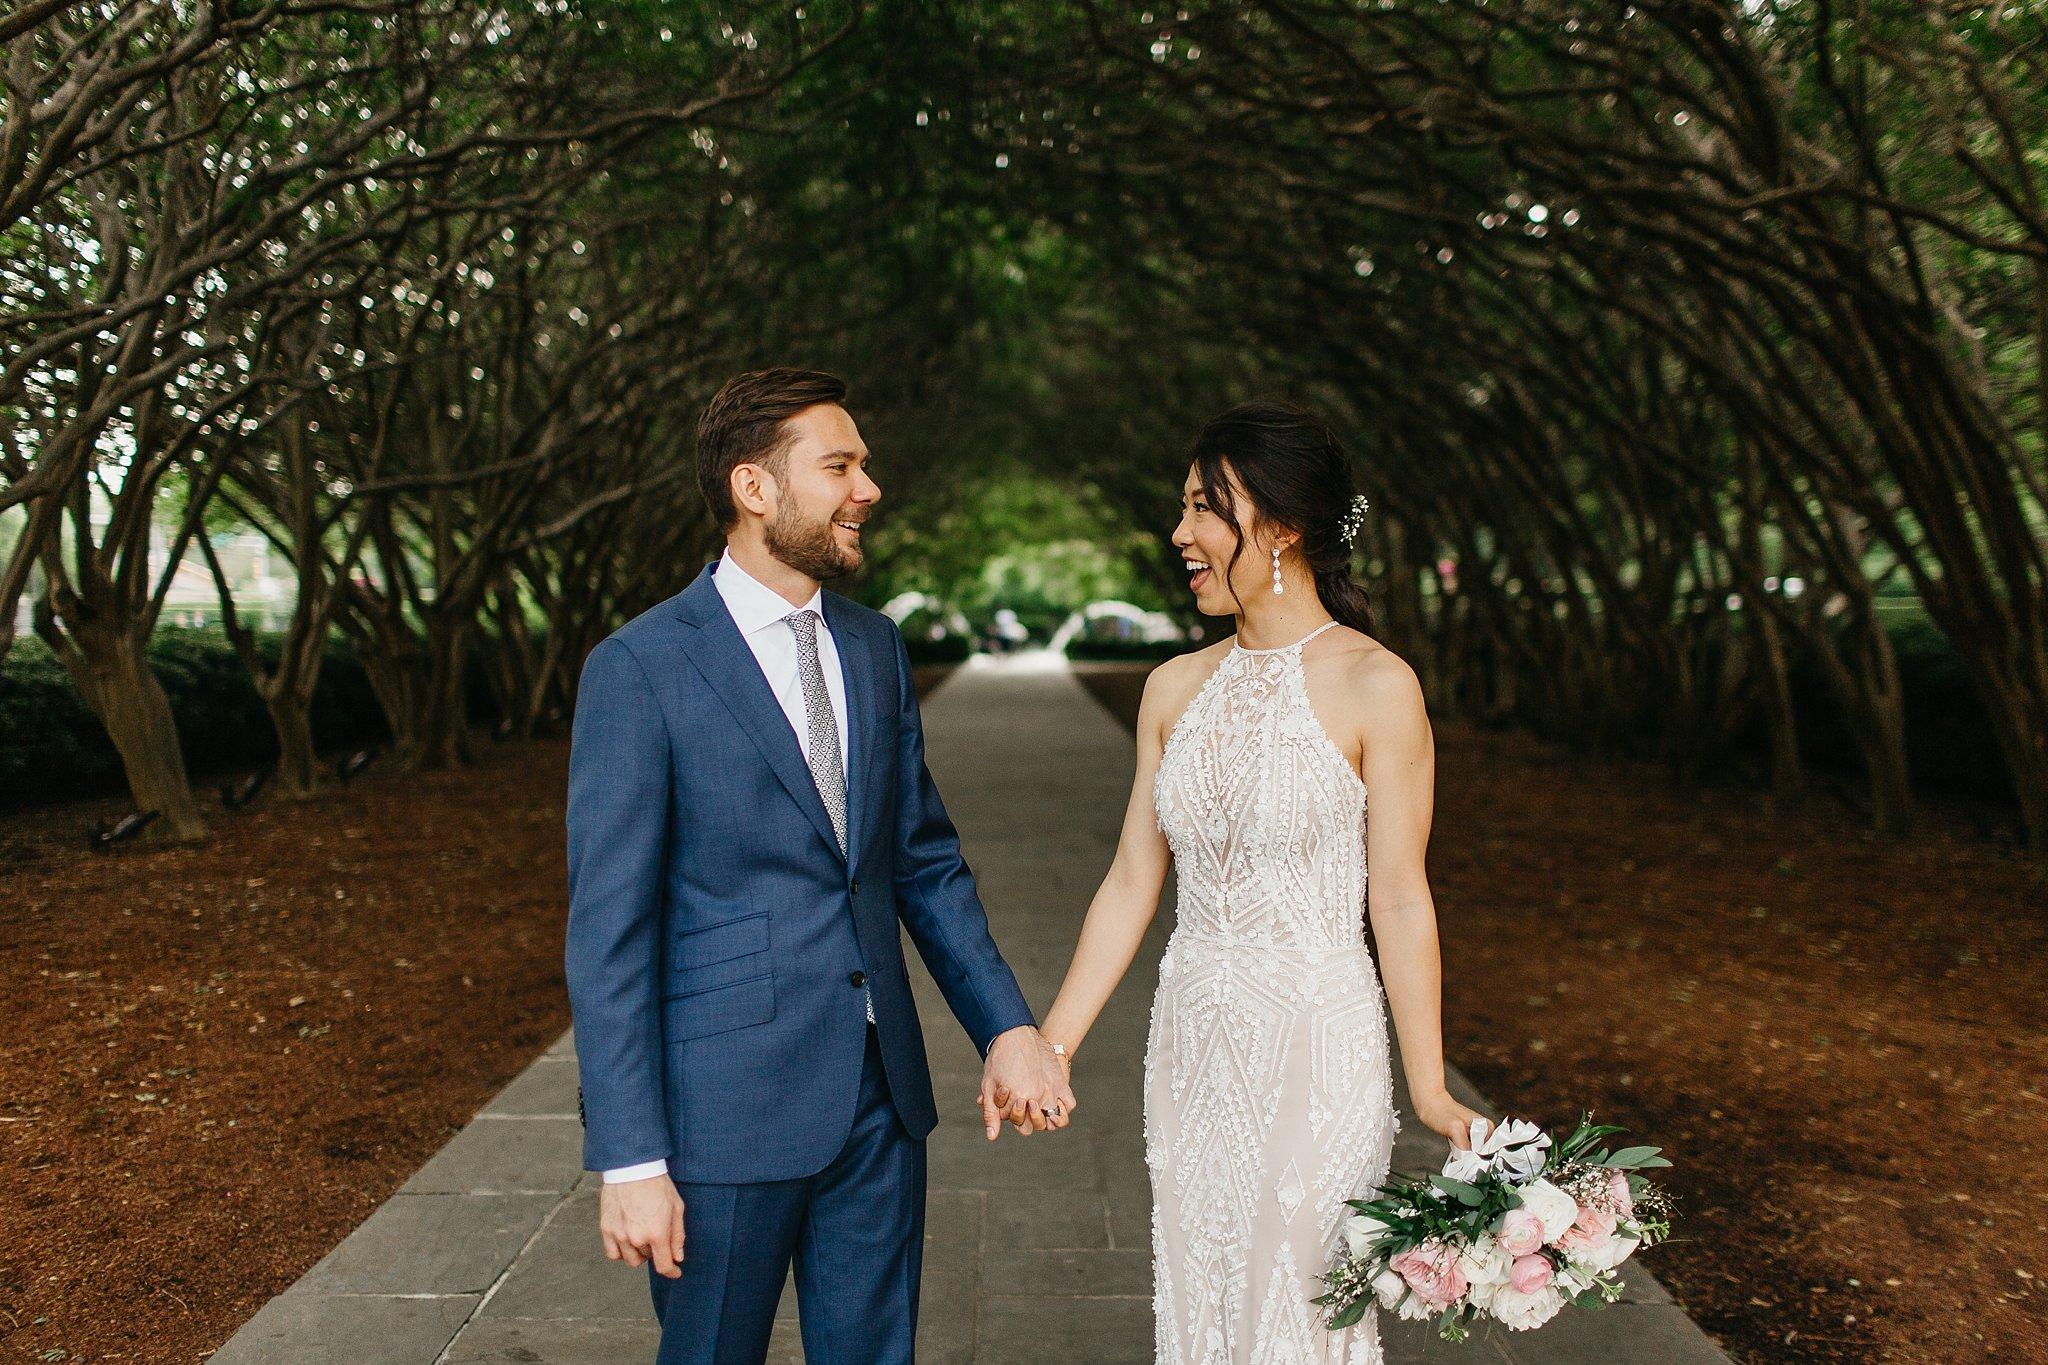 Wilderlove Co_Dallas Texas_Wedding Elopement_Arboretum_Photography_0005.jpg